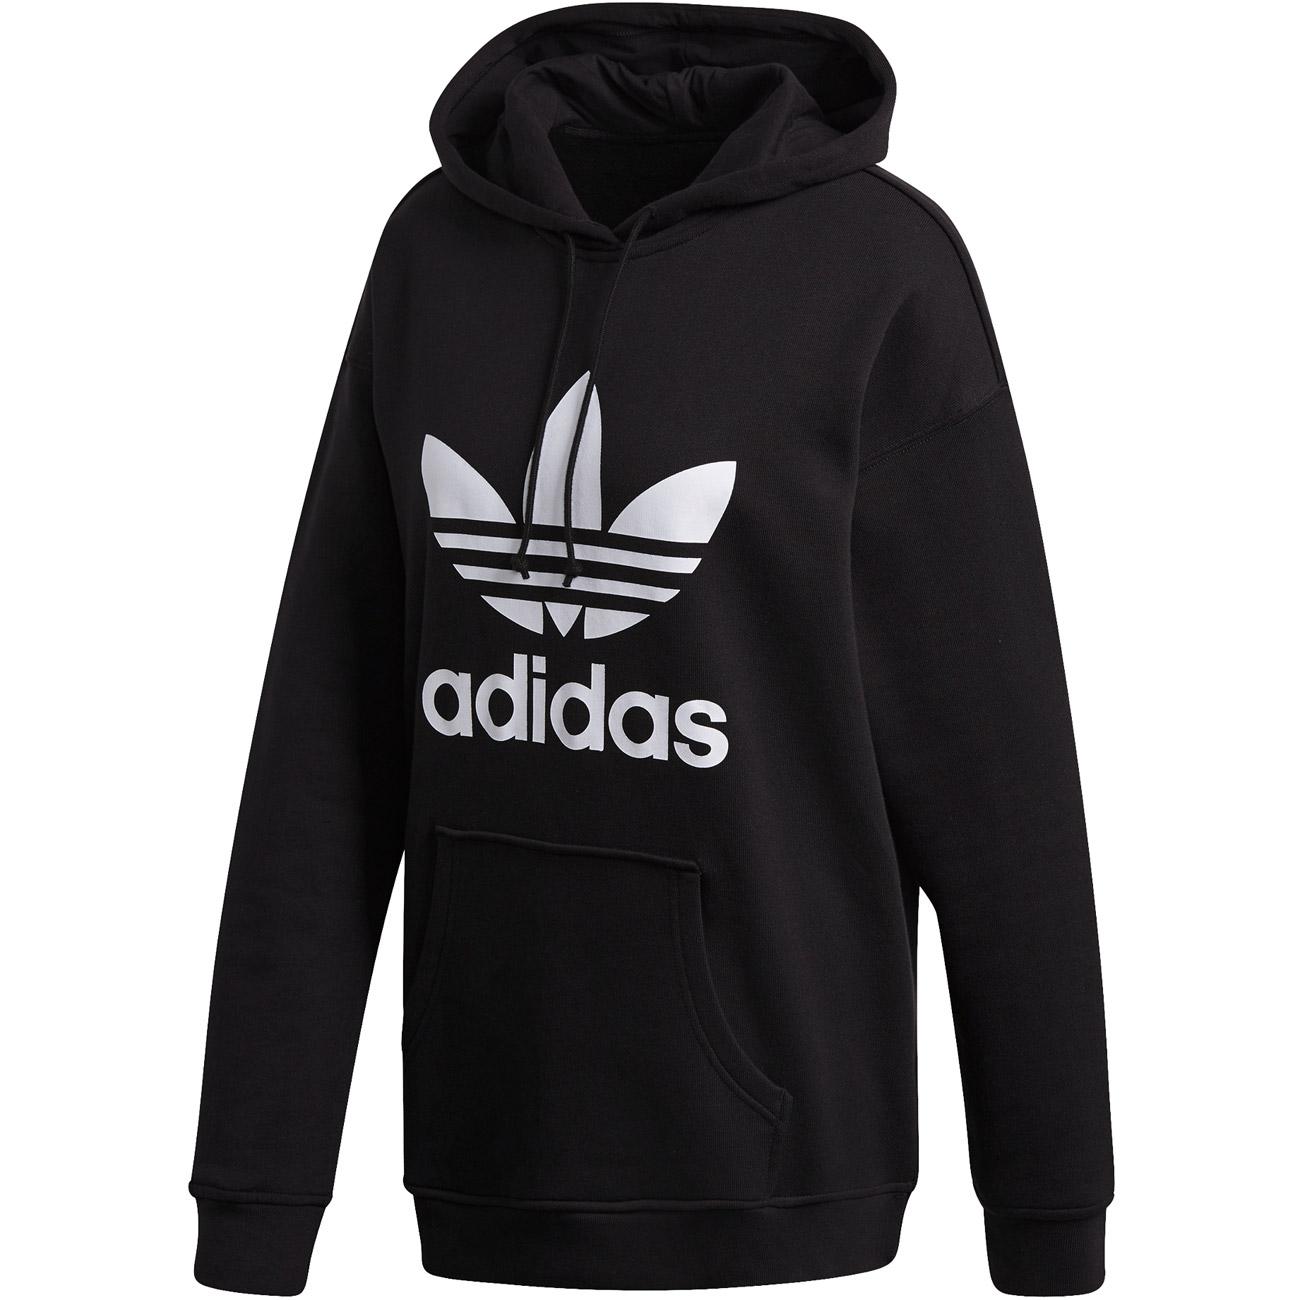 Adidas Originals Damen Hoodie TRF HOODIE